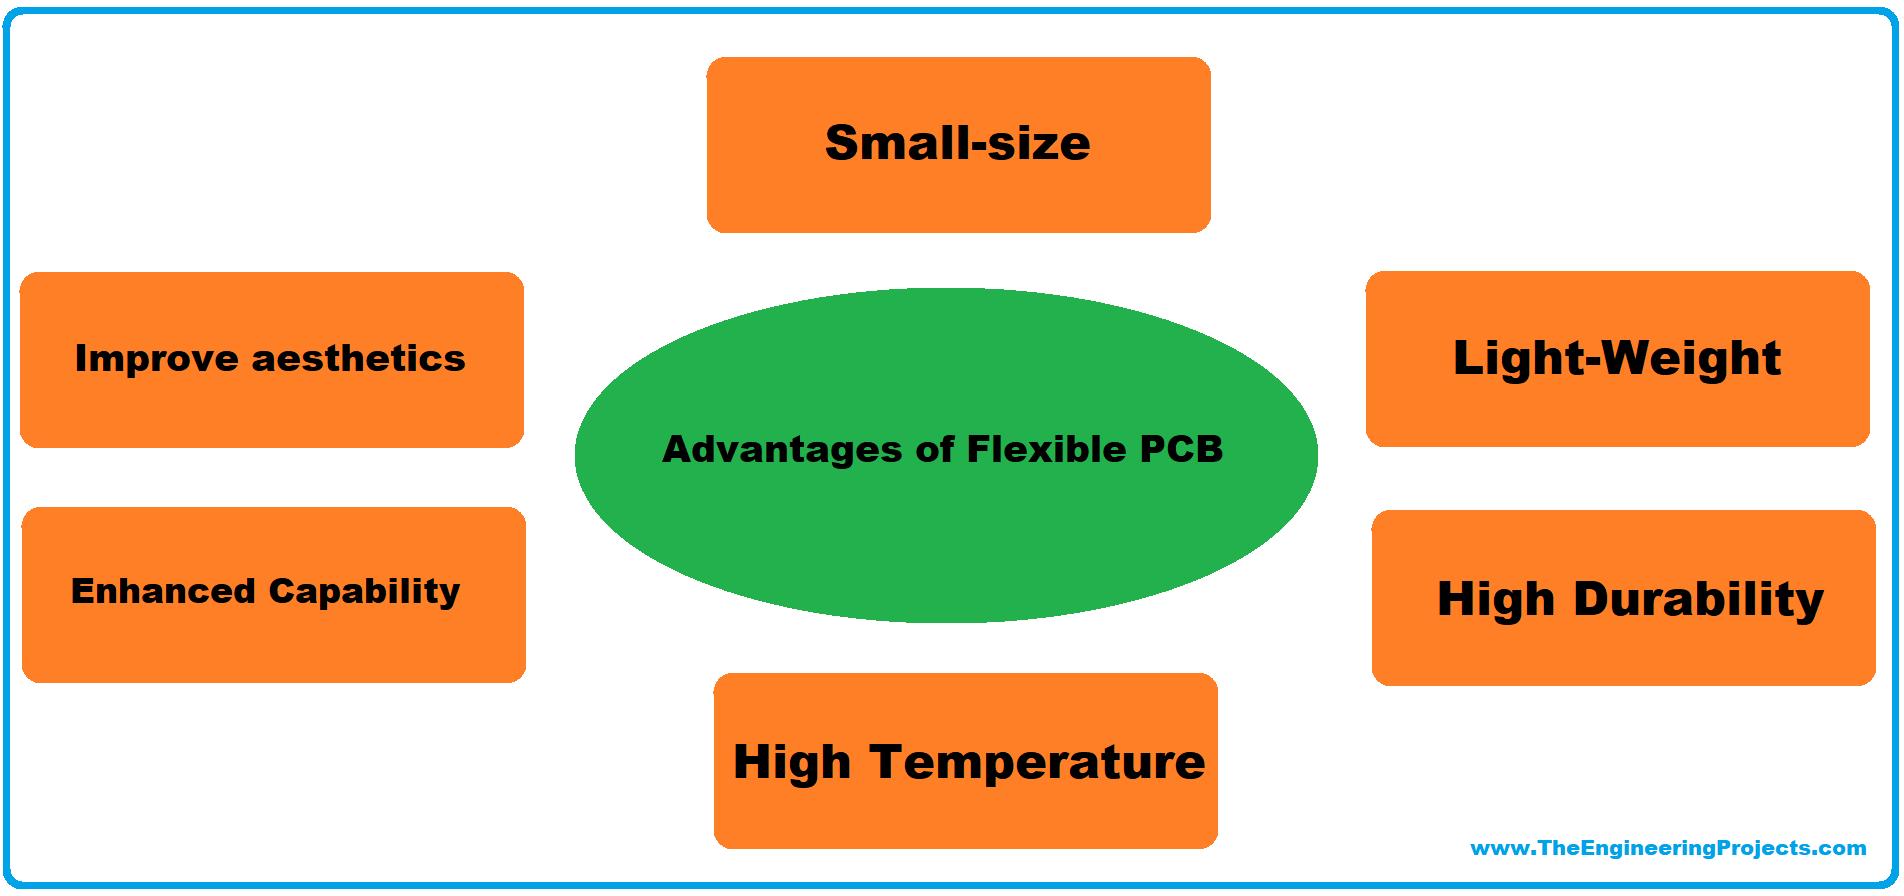 flexible pcb, flex pcb, introduction to flexible pcb, intro to flexible pcb, what is flexible pcb, what is flex pcb, applications of flexible pcb, fabrication of flexible pcb, advantages of flexible pcb, flex pcb advantages